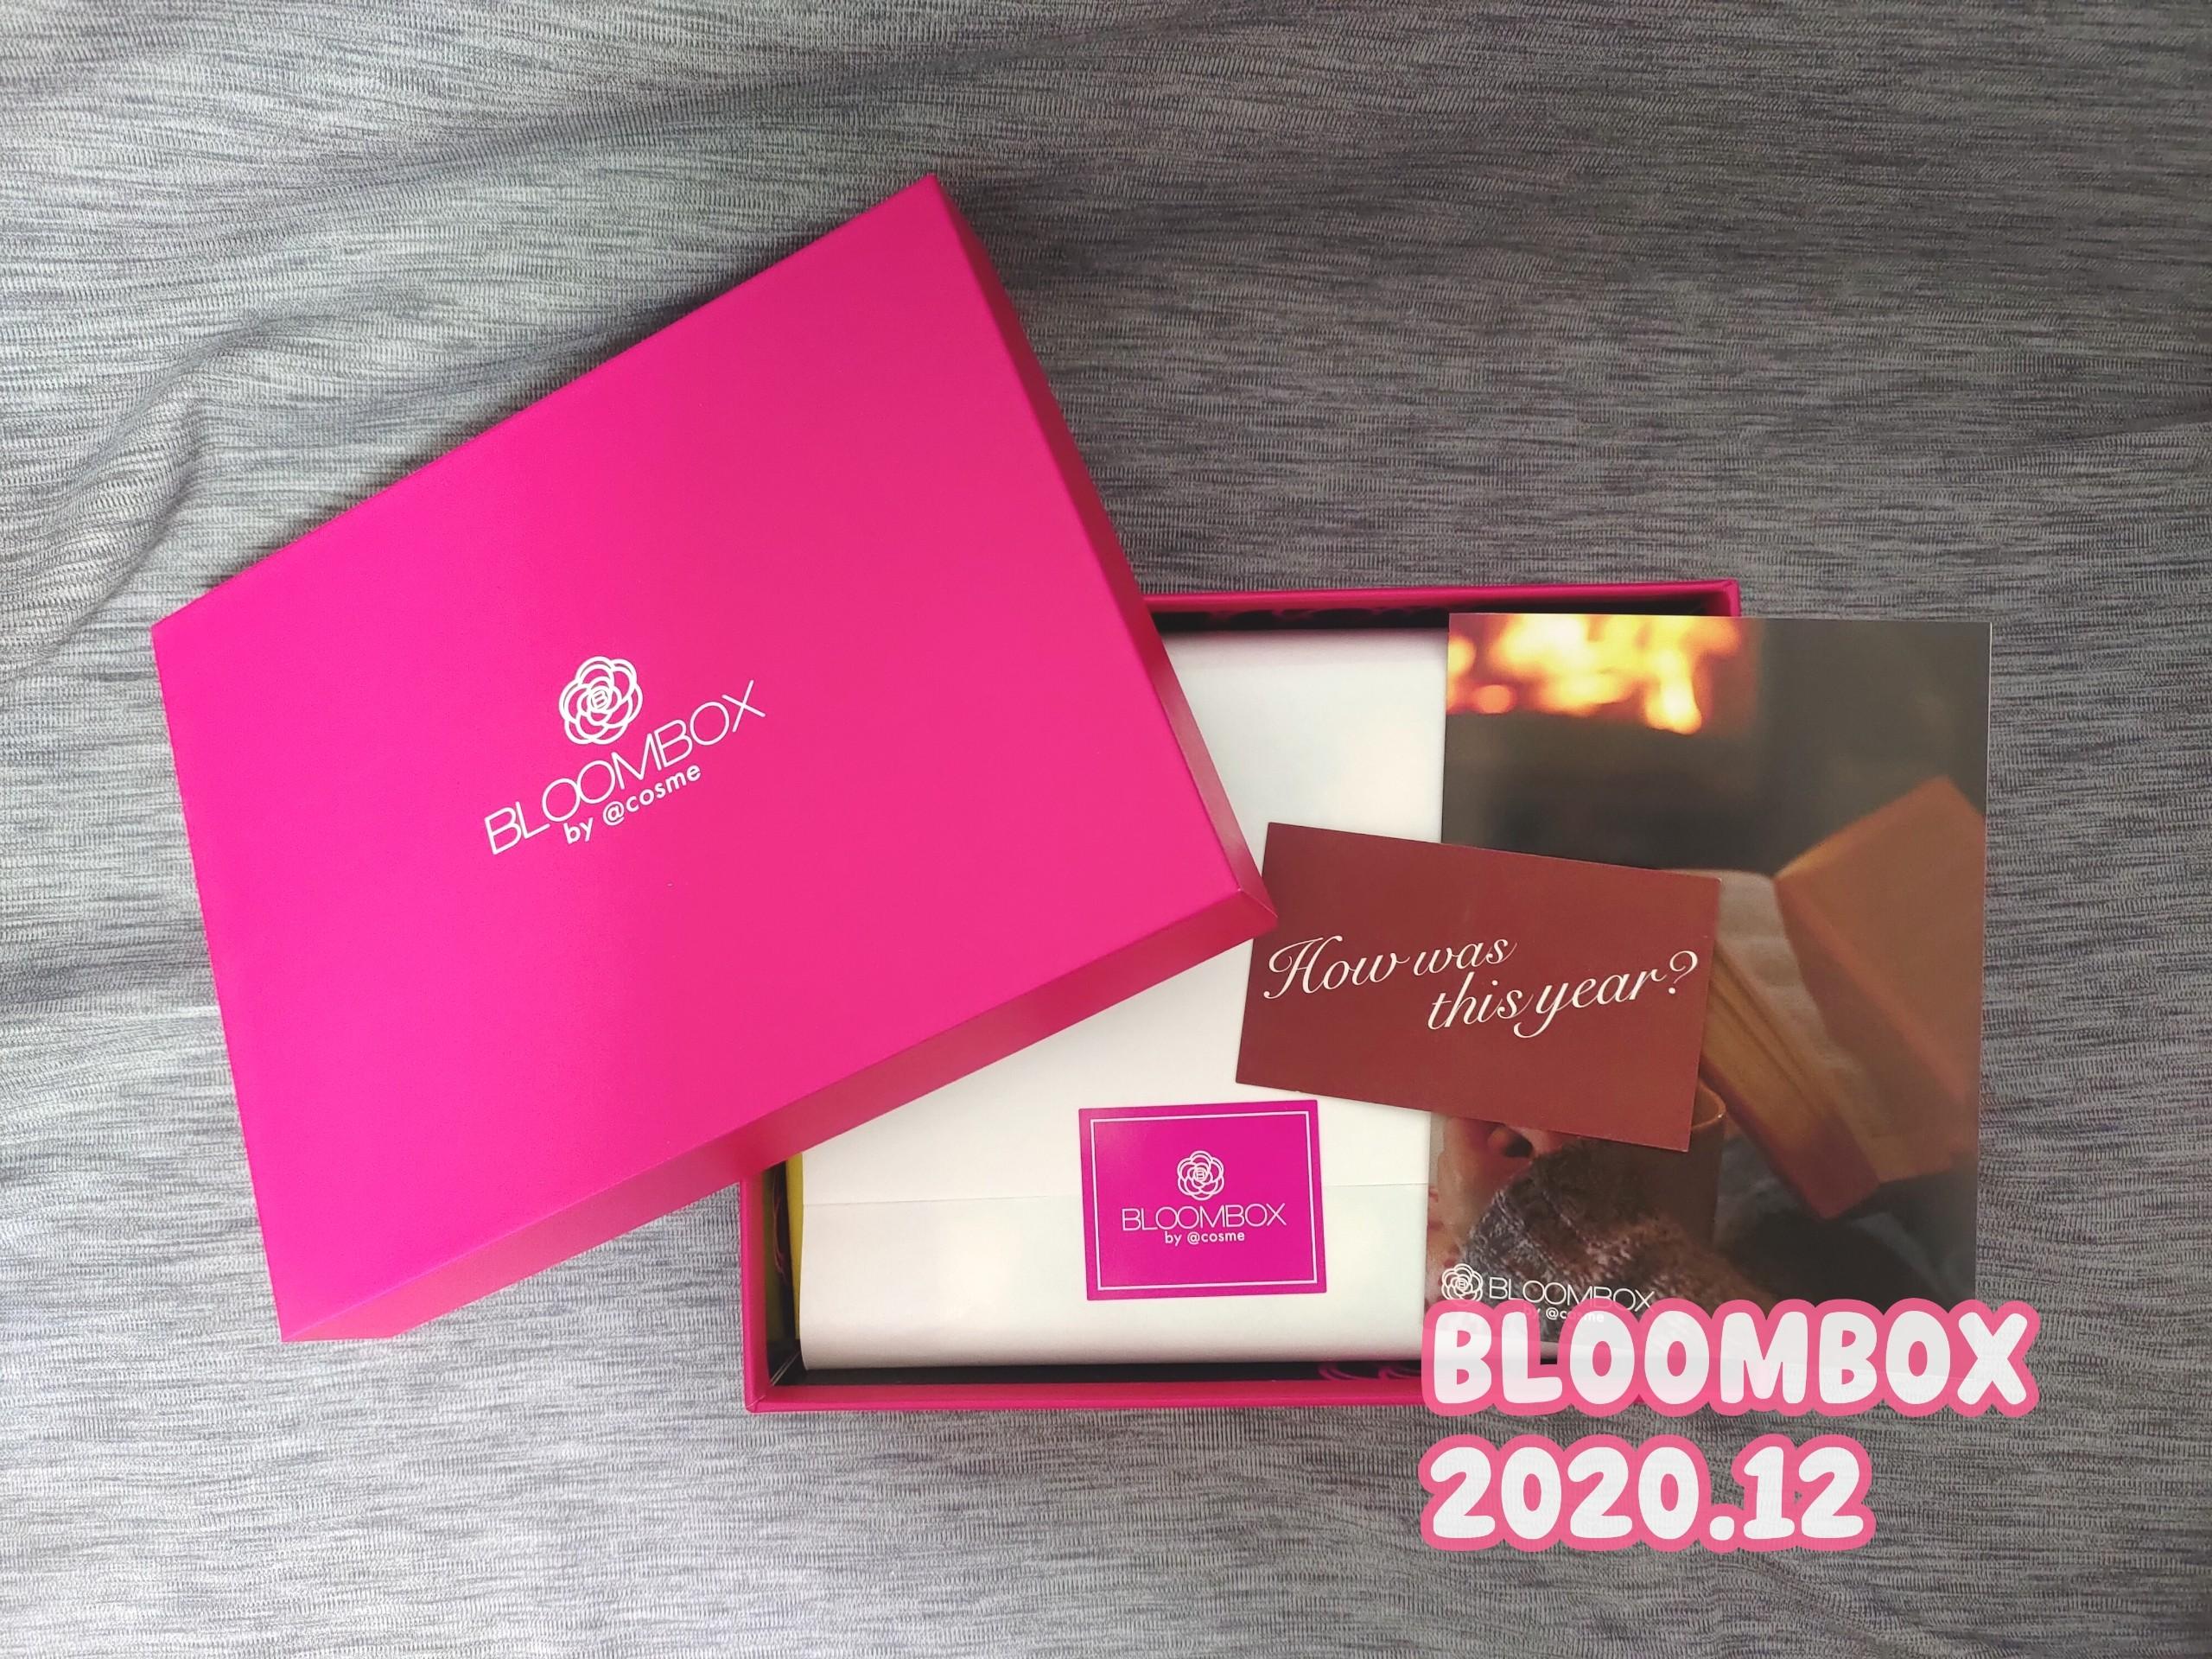 BLOOMBOX 2020年12月 中身公開【デパコスと愛用美容液】